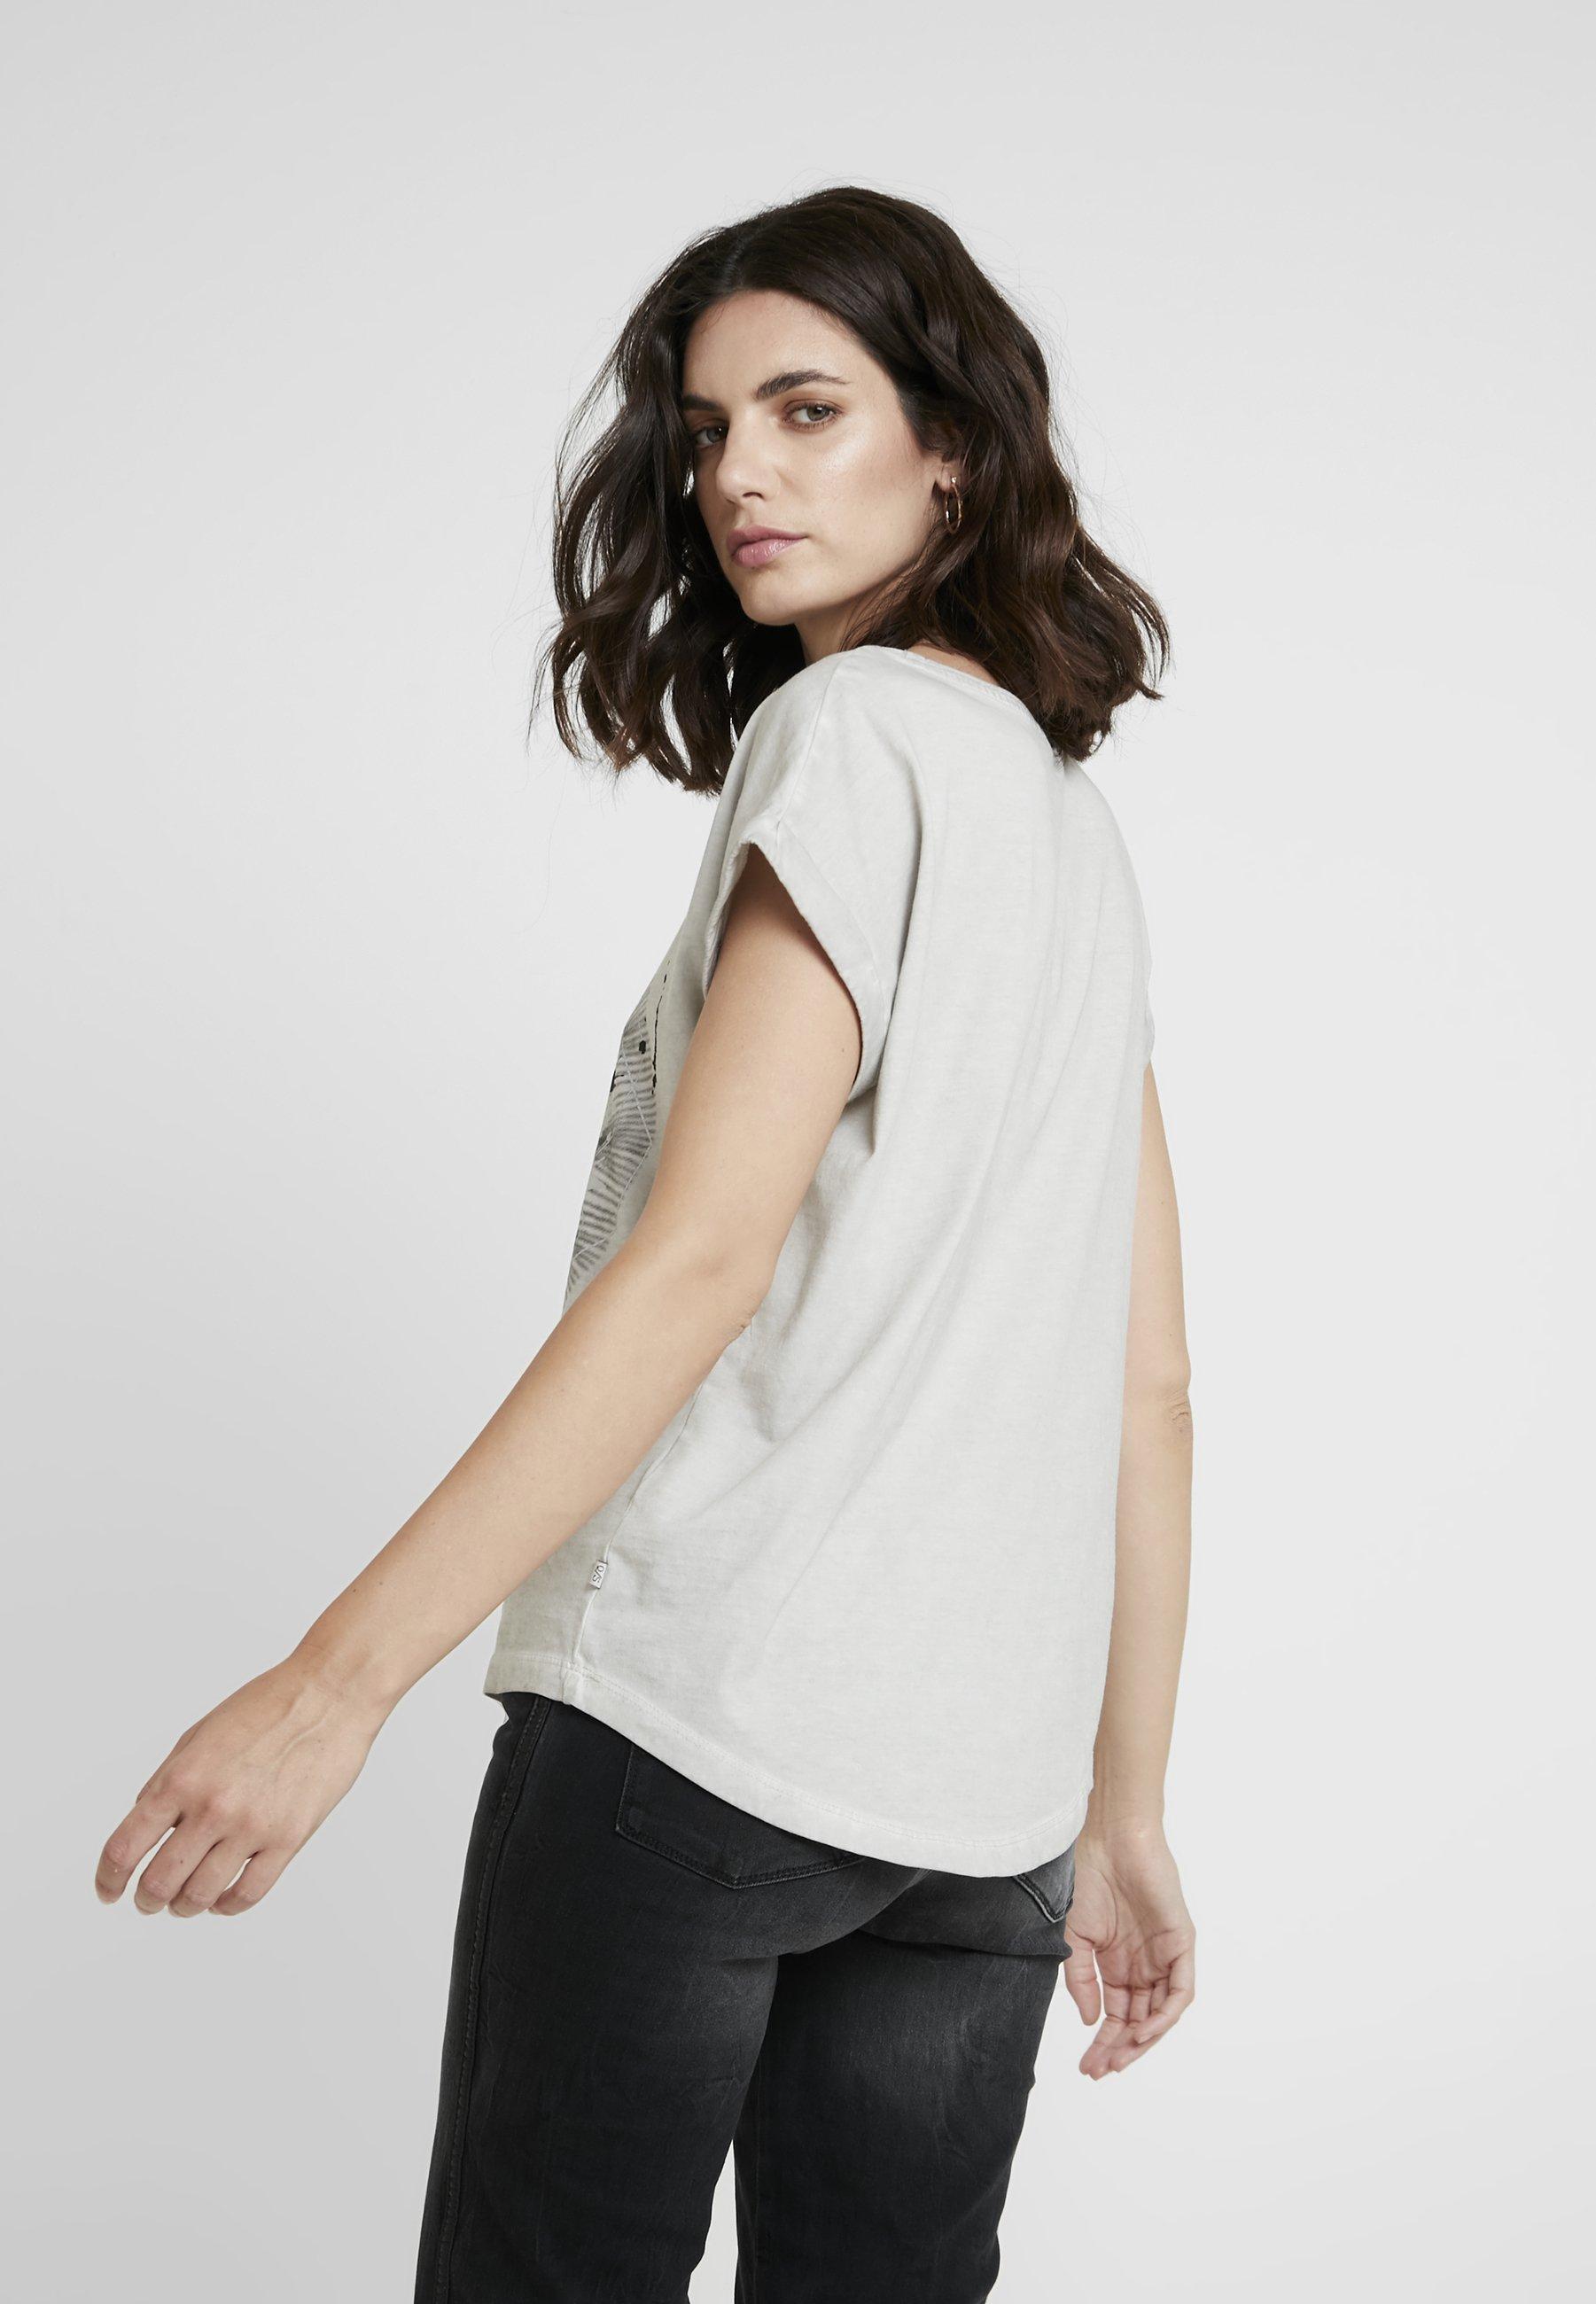 Q KurzarmT shirt Imprimé Off By s white Designed lFcJKT1